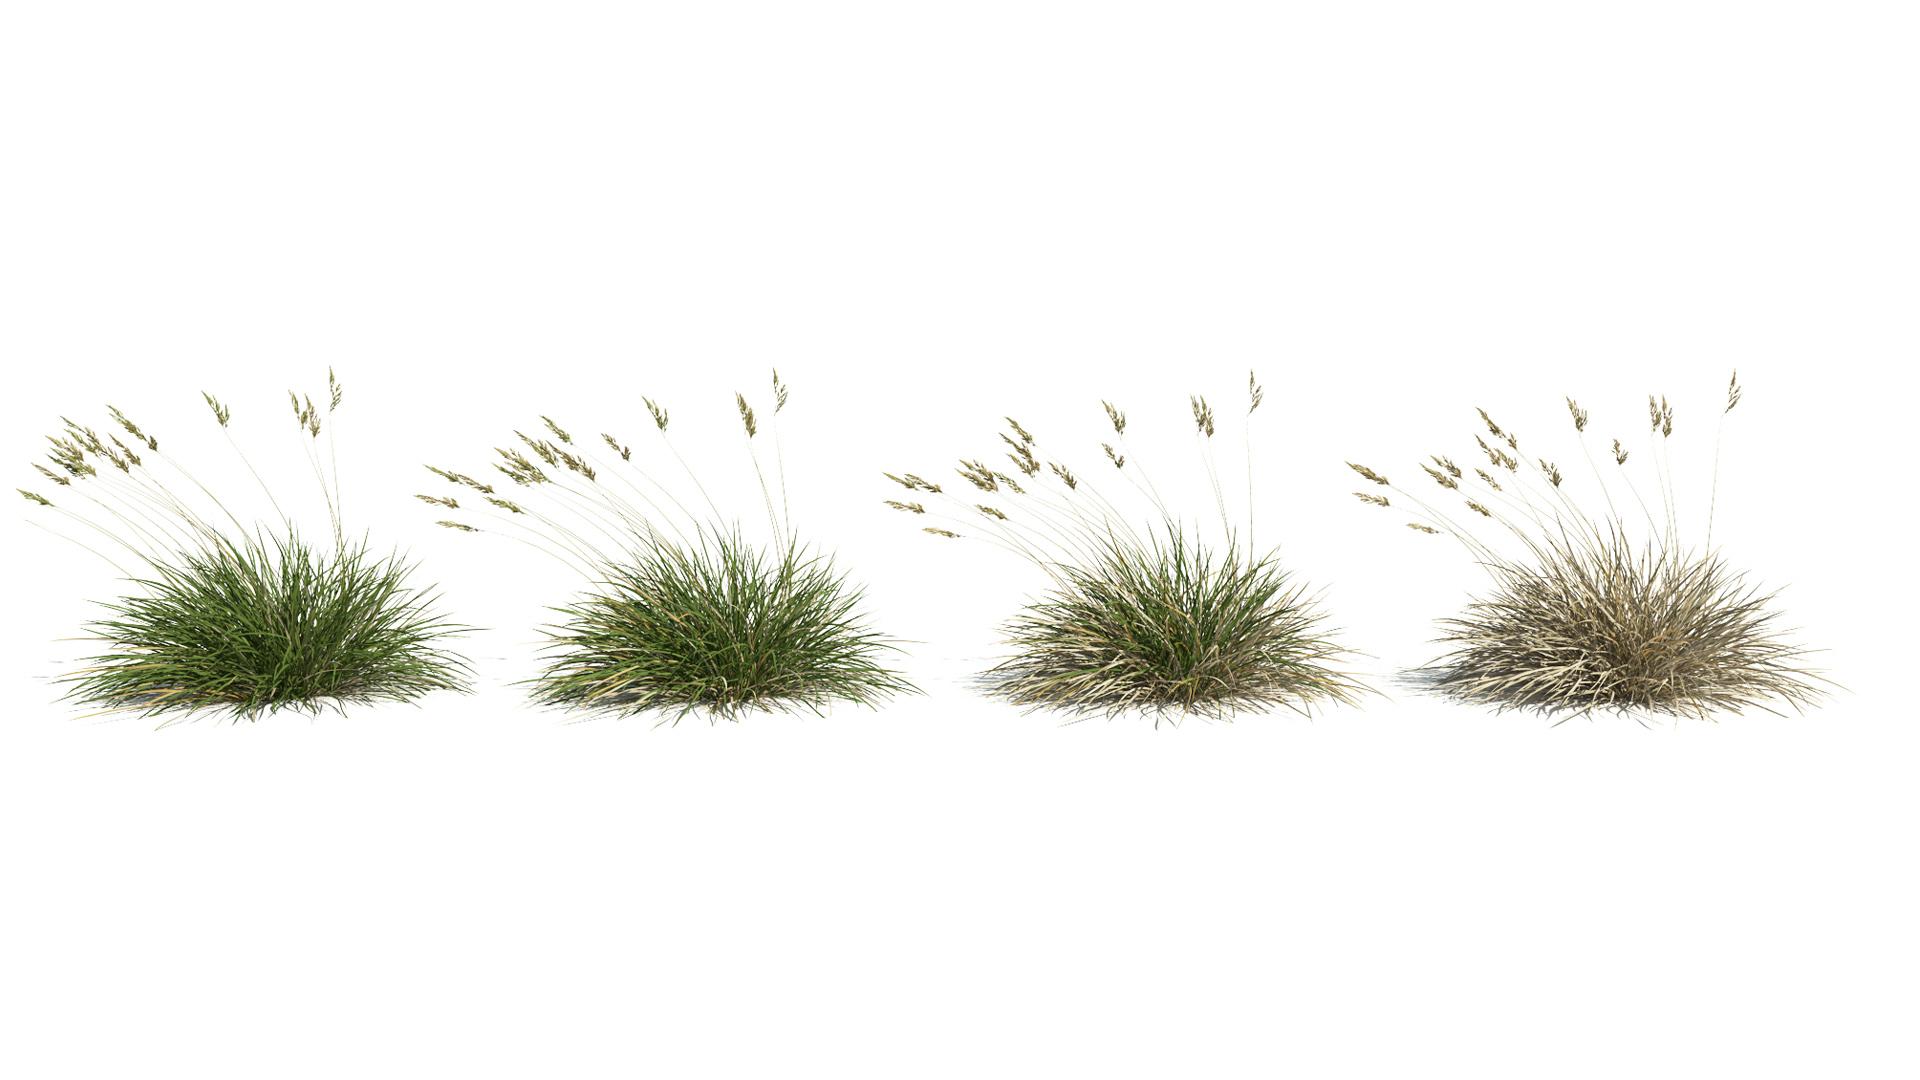 3D model of the Spiky fescue Festuca gautieri health variations